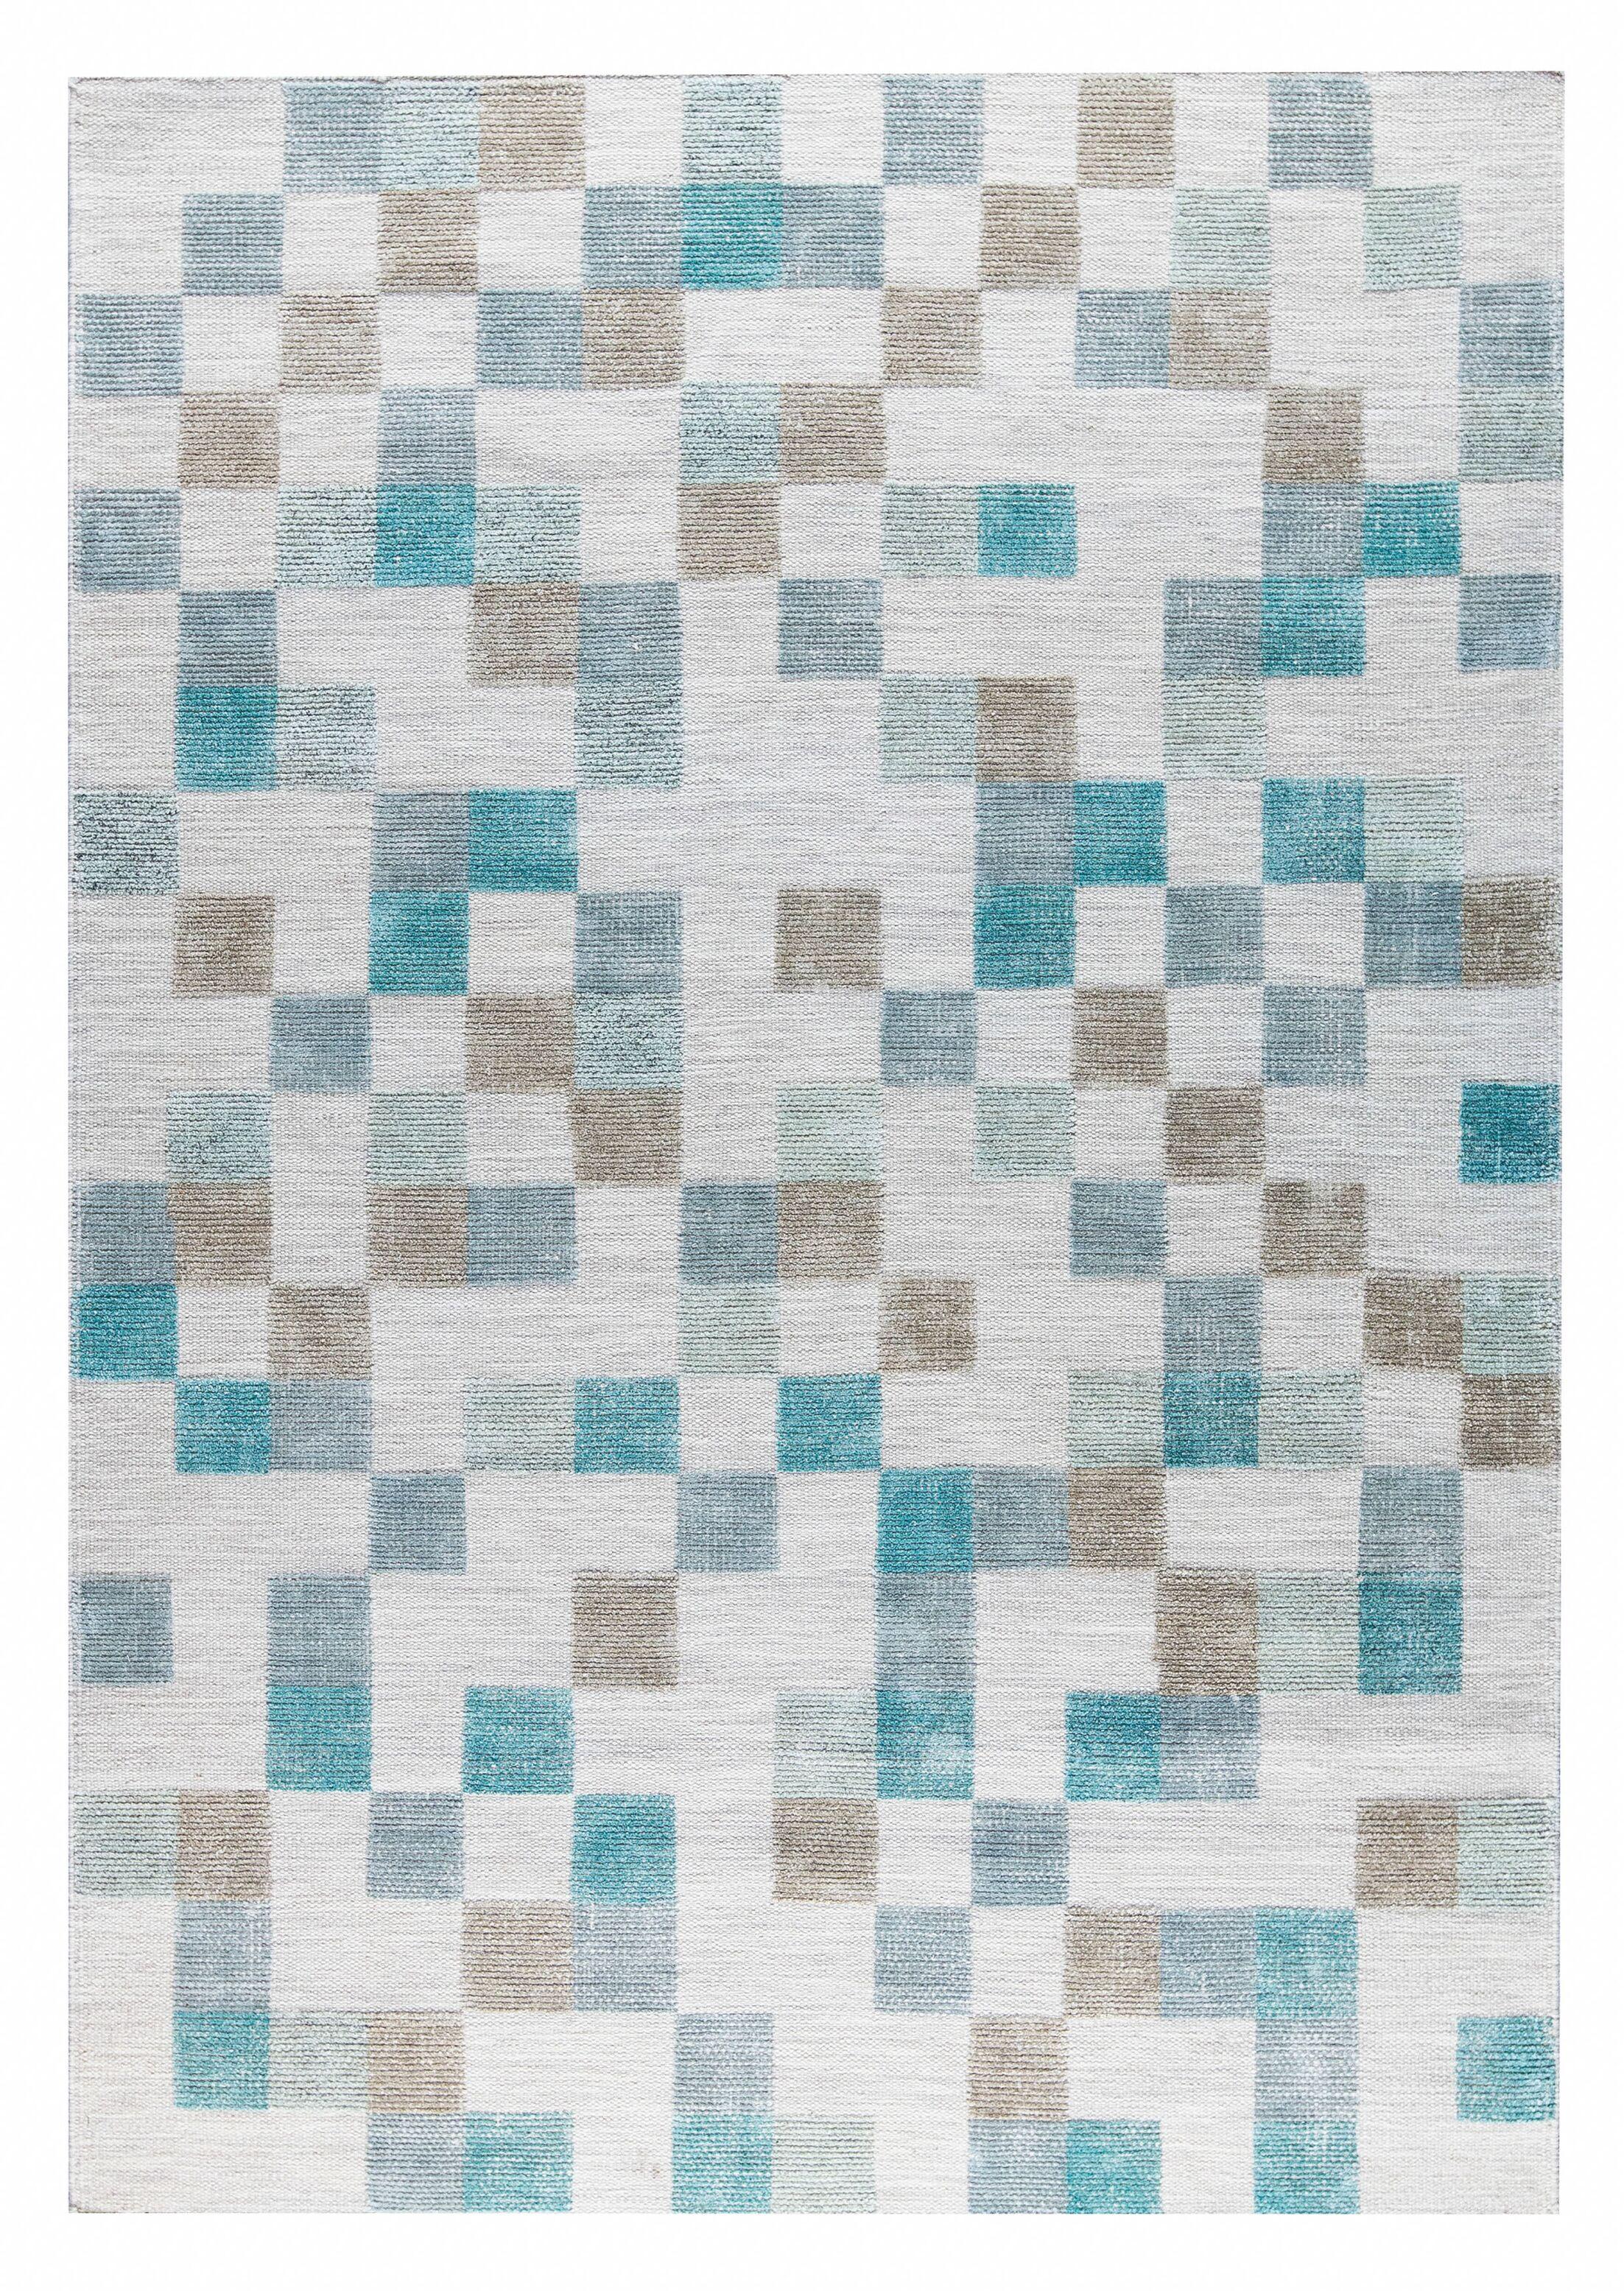 Kista Hand-Woven Aqua/Brown Area Rug Rug Size: 5' x 8'